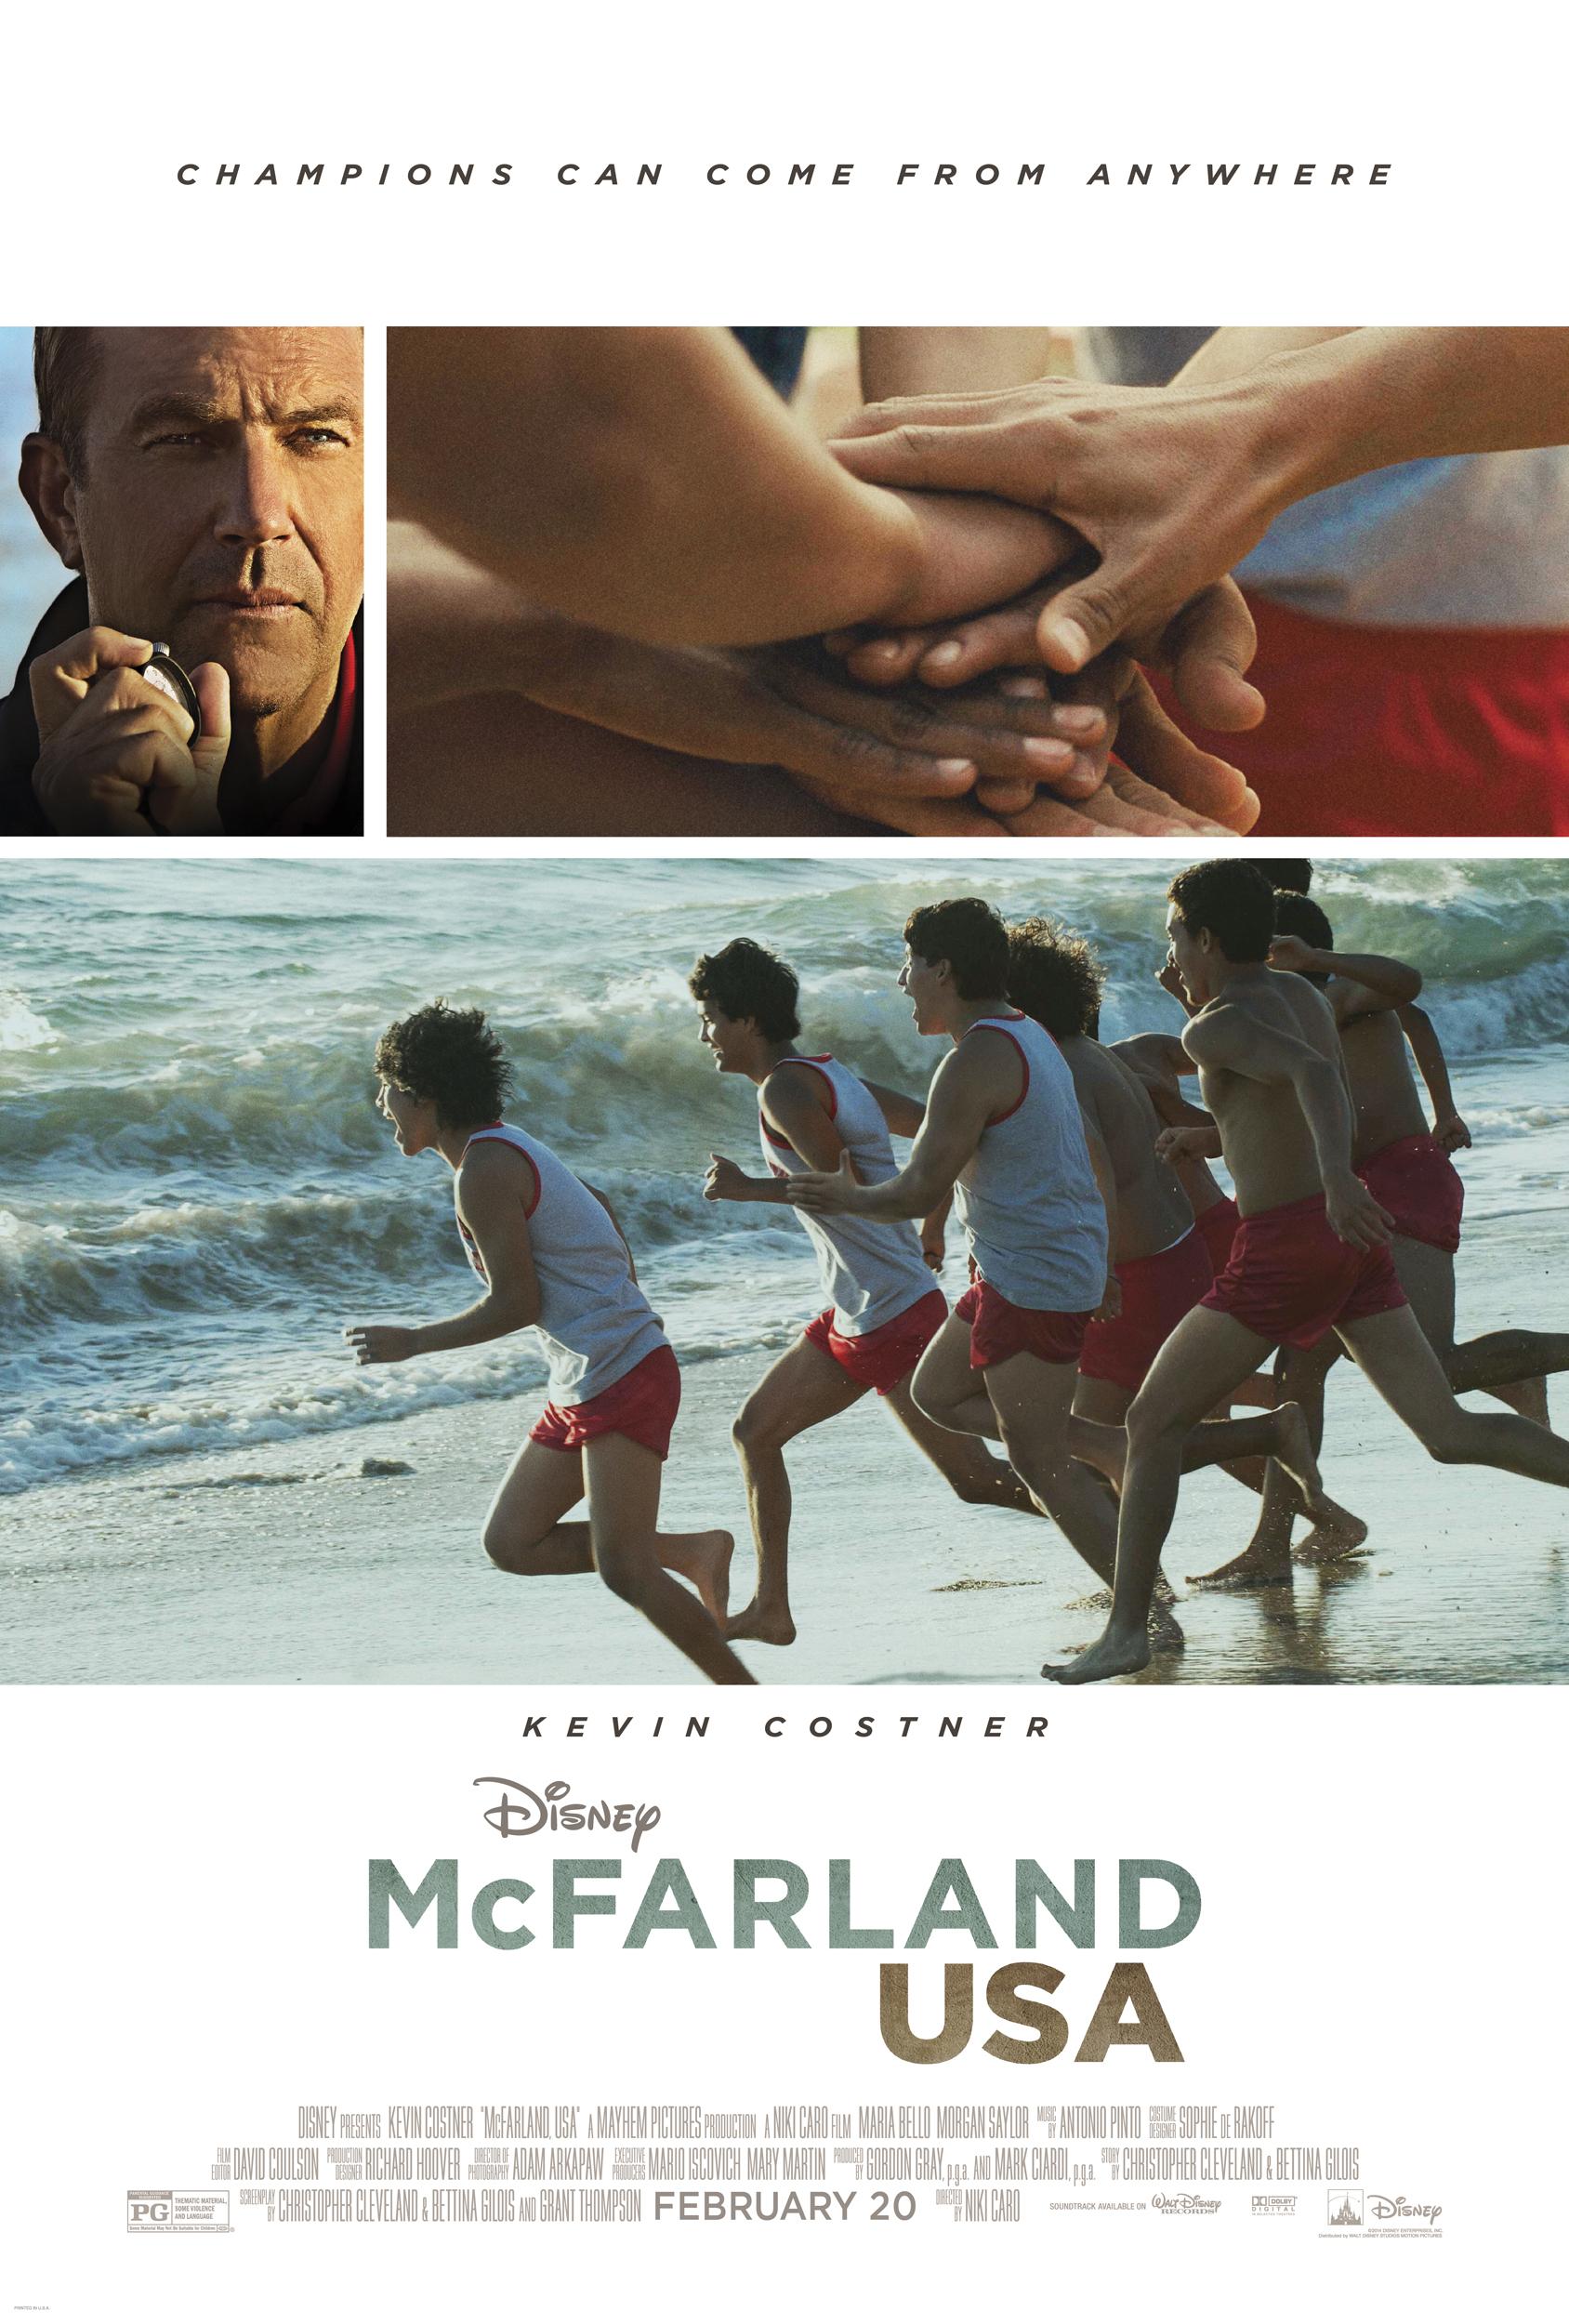 Disney's McFarland, USA {Movie Review} Opens Feb. 20th, 2015